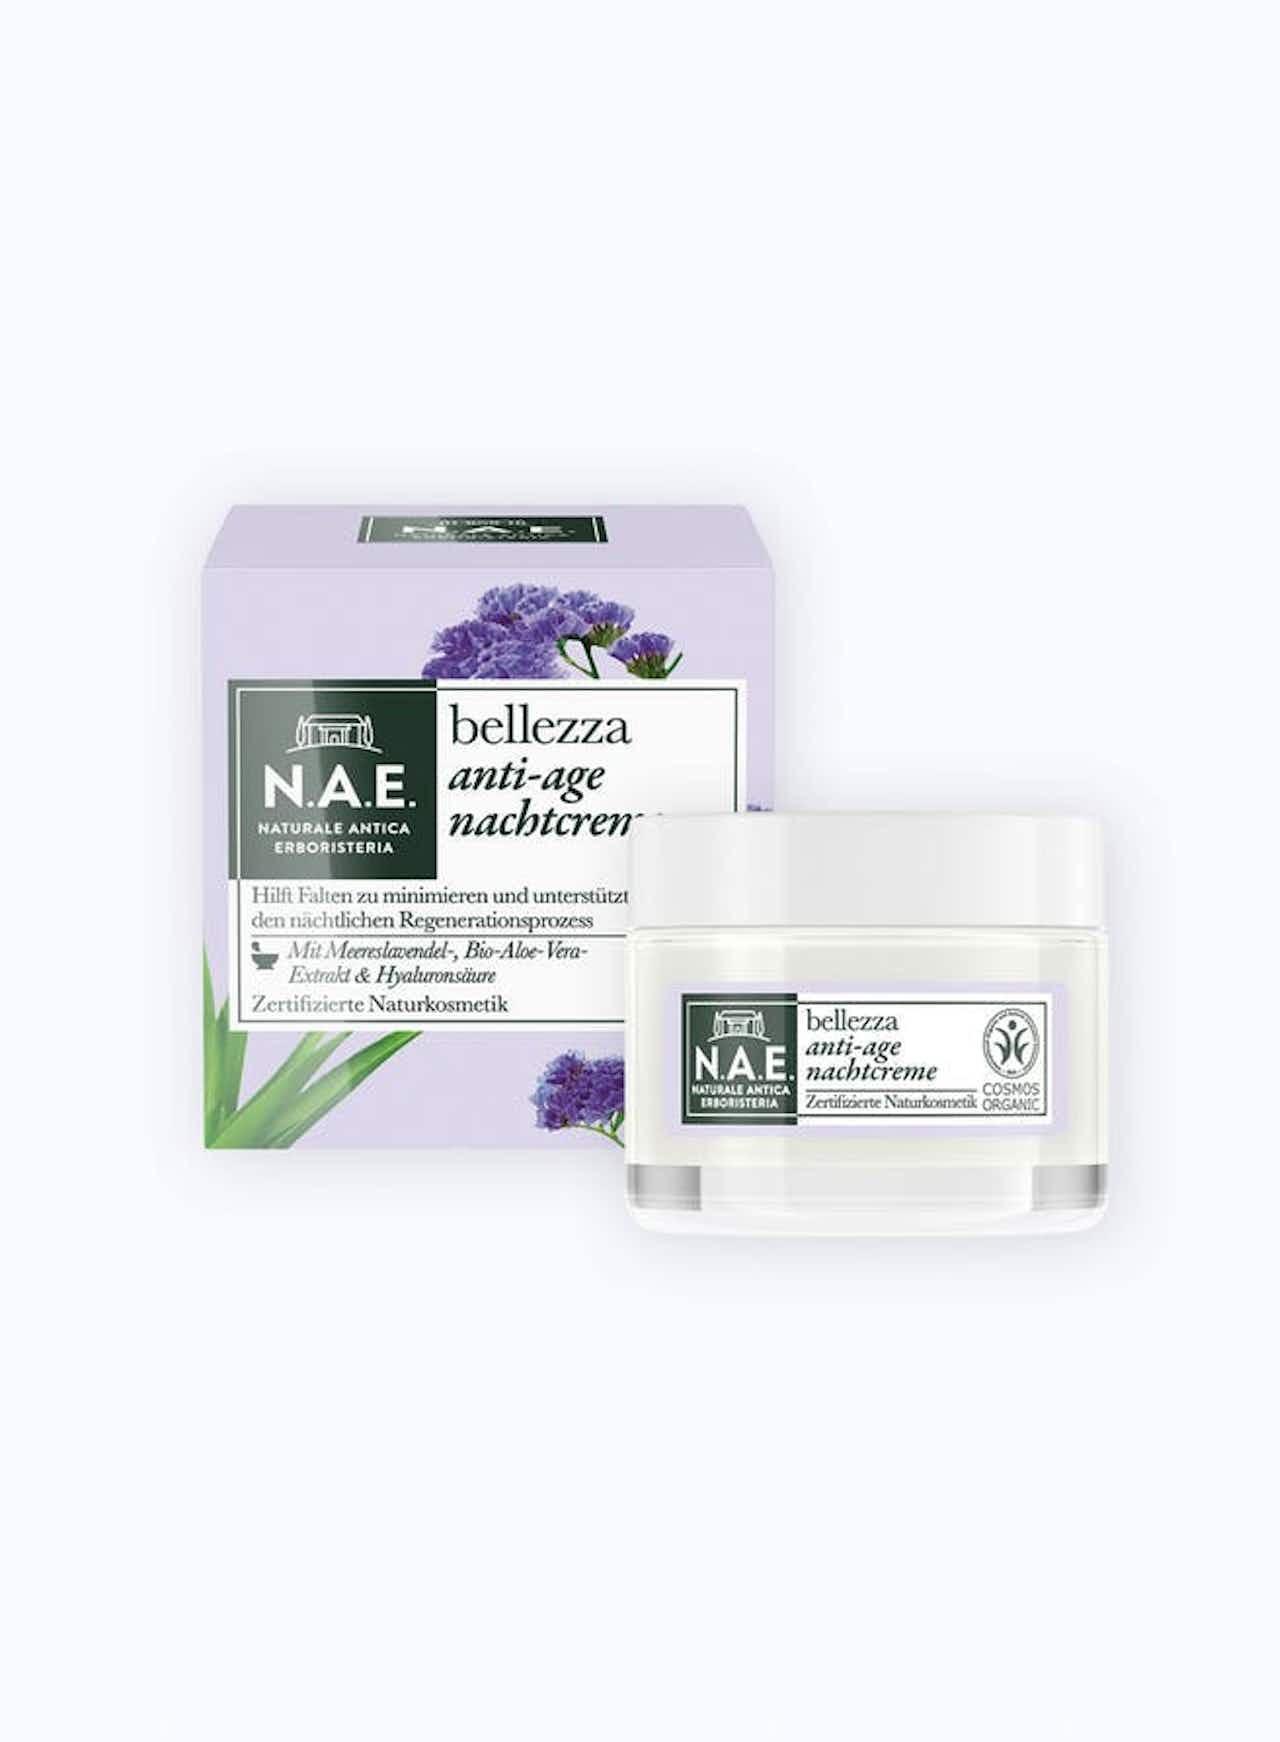 bellezza anti-age nachtcreme | anti-age night cream